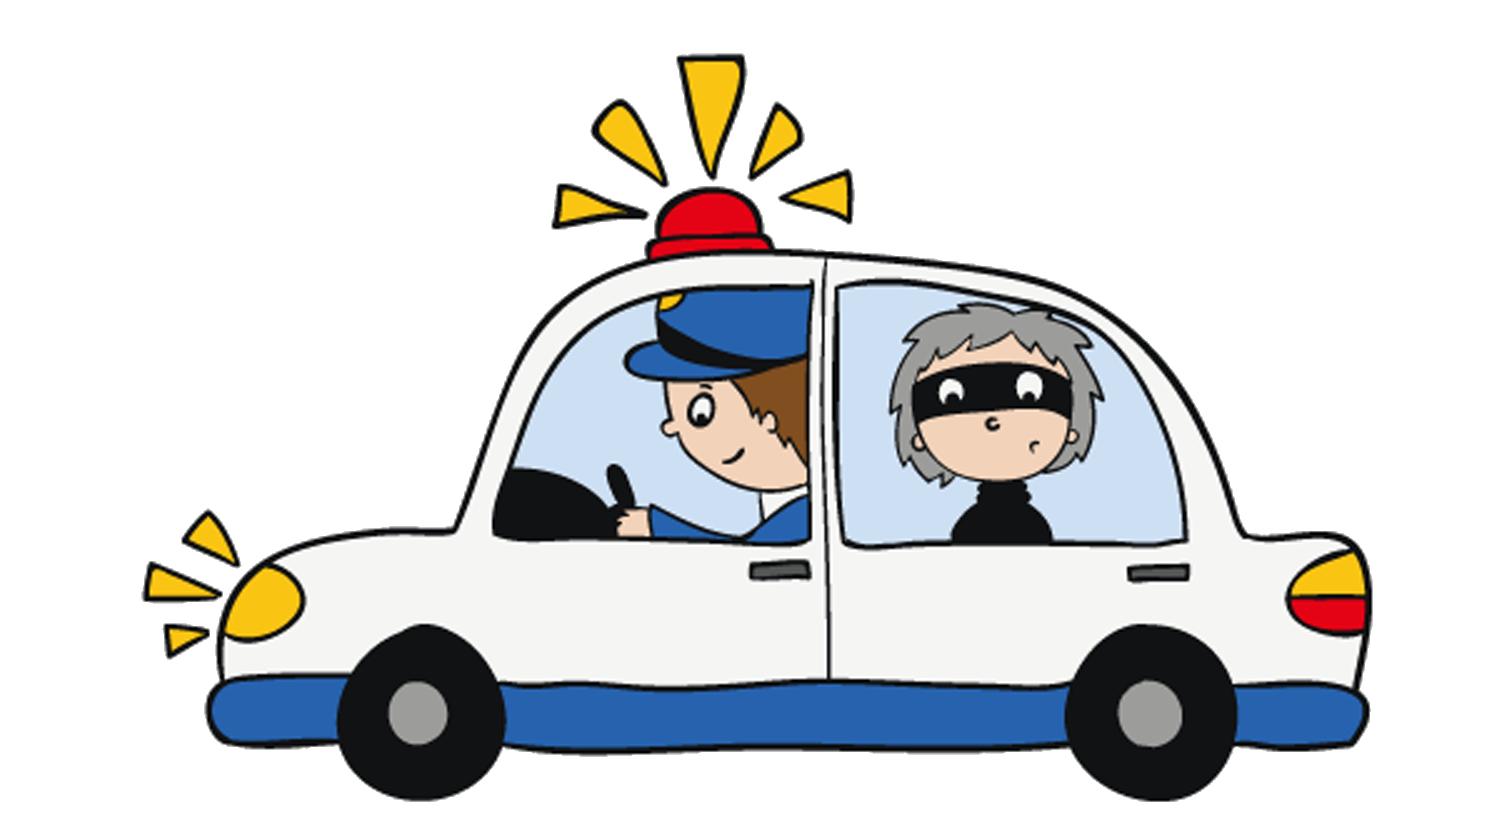 Open car door clipart jpg black and white stock Police officer Theft Siren - Open police car police 1506*827 ... jpg black and white stock